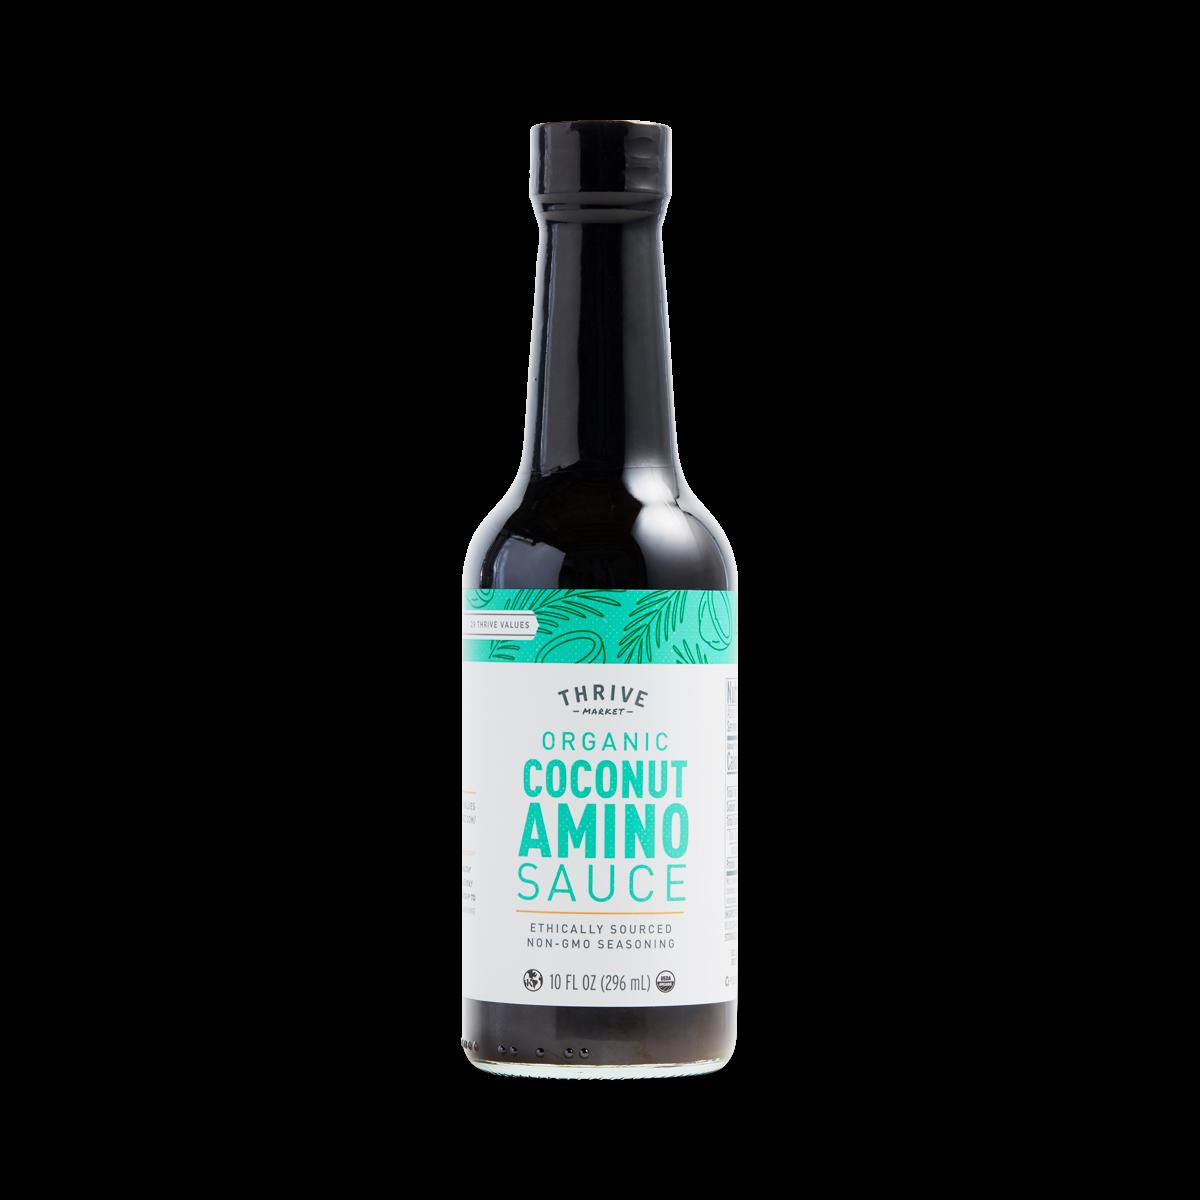 Coconut amino